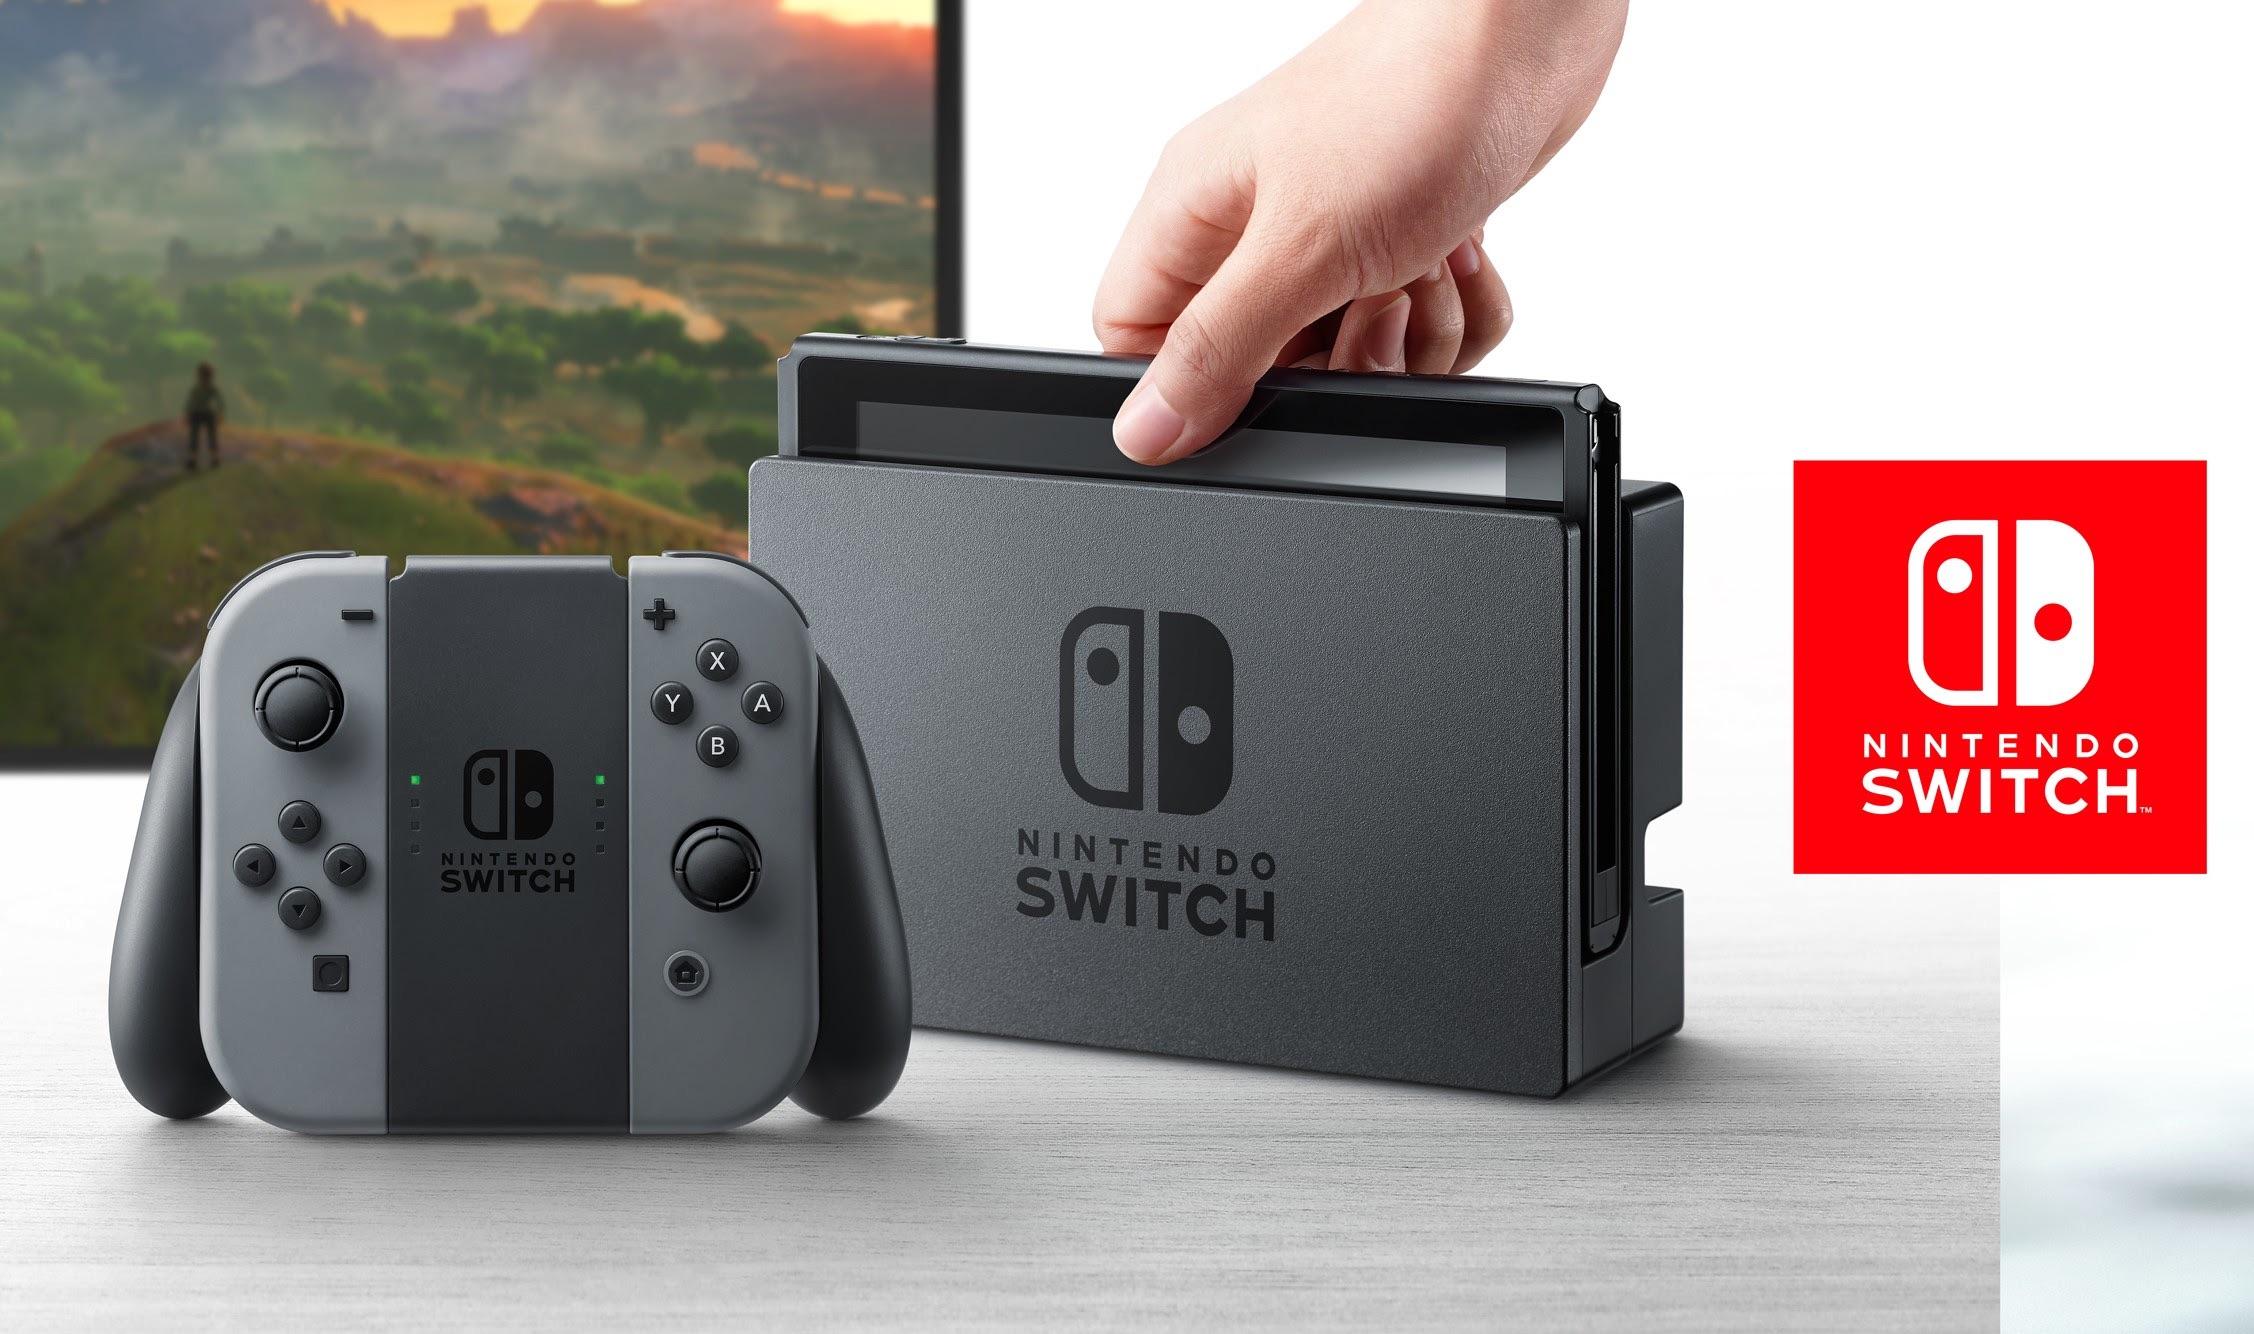 precio nintendo switch amazon